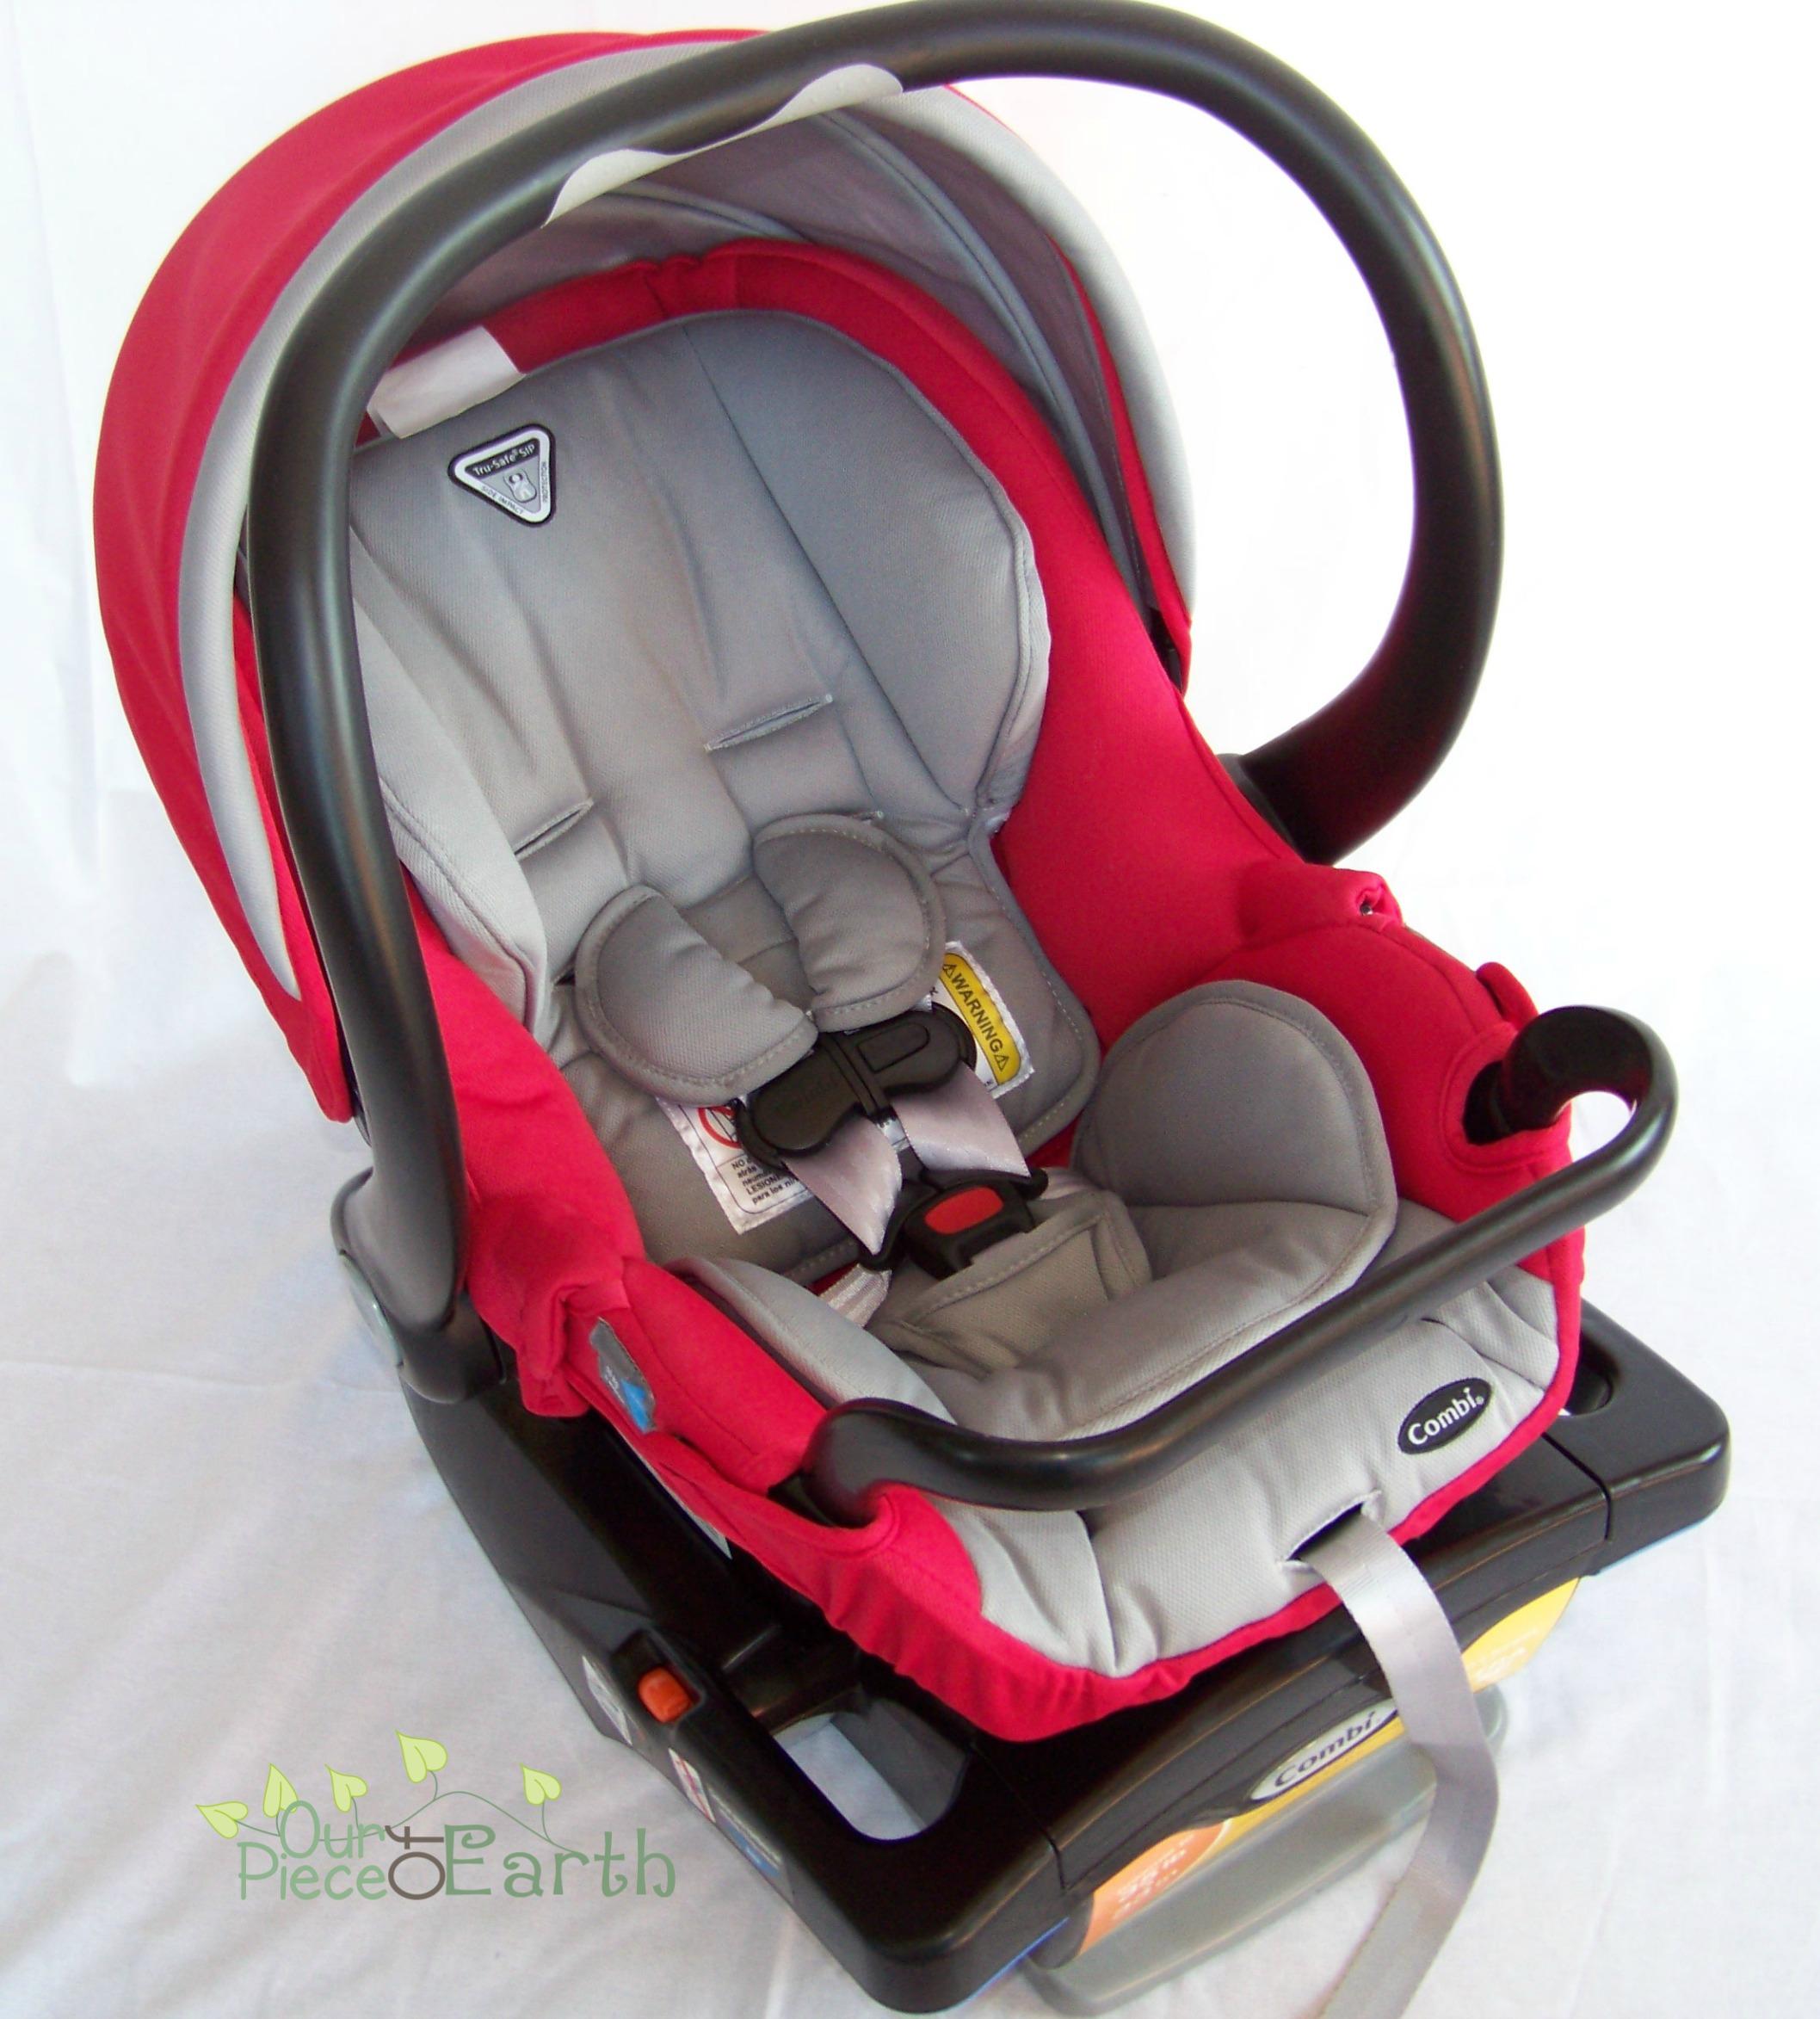 The Combi Shuttle Car Seat